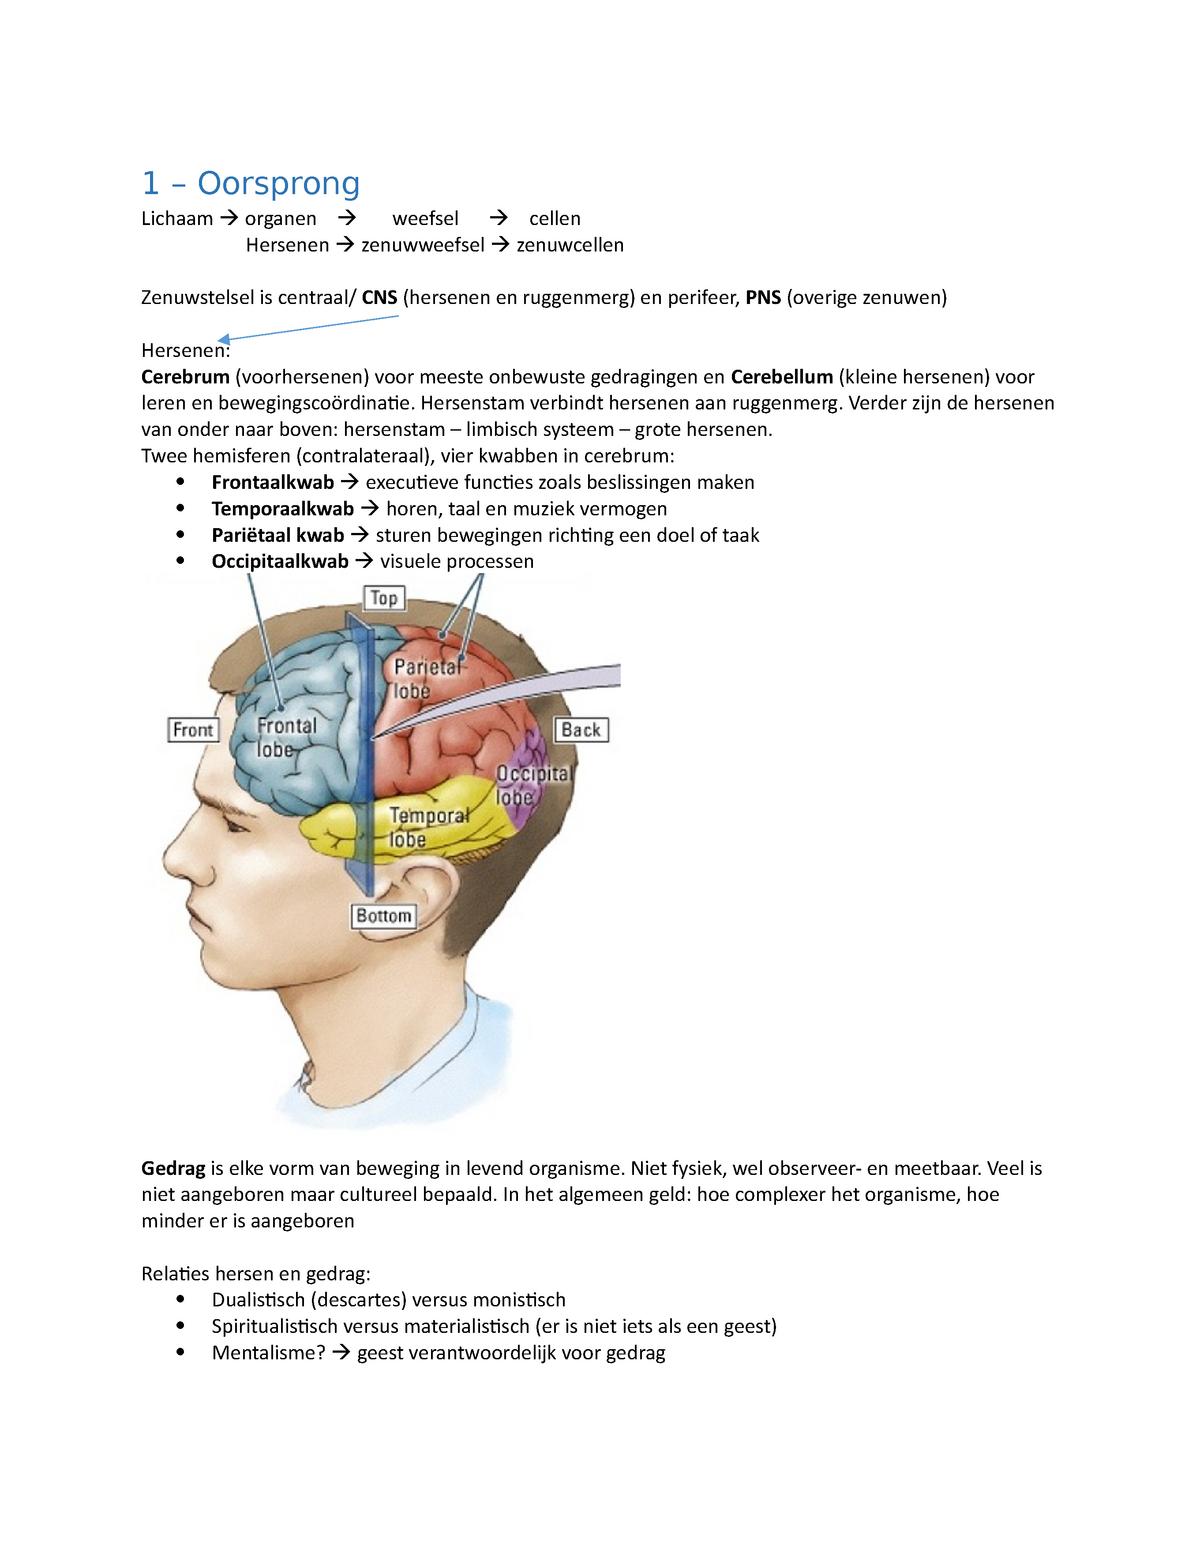 Hersenen En Gedrag Samenvatting Brain And Behavior